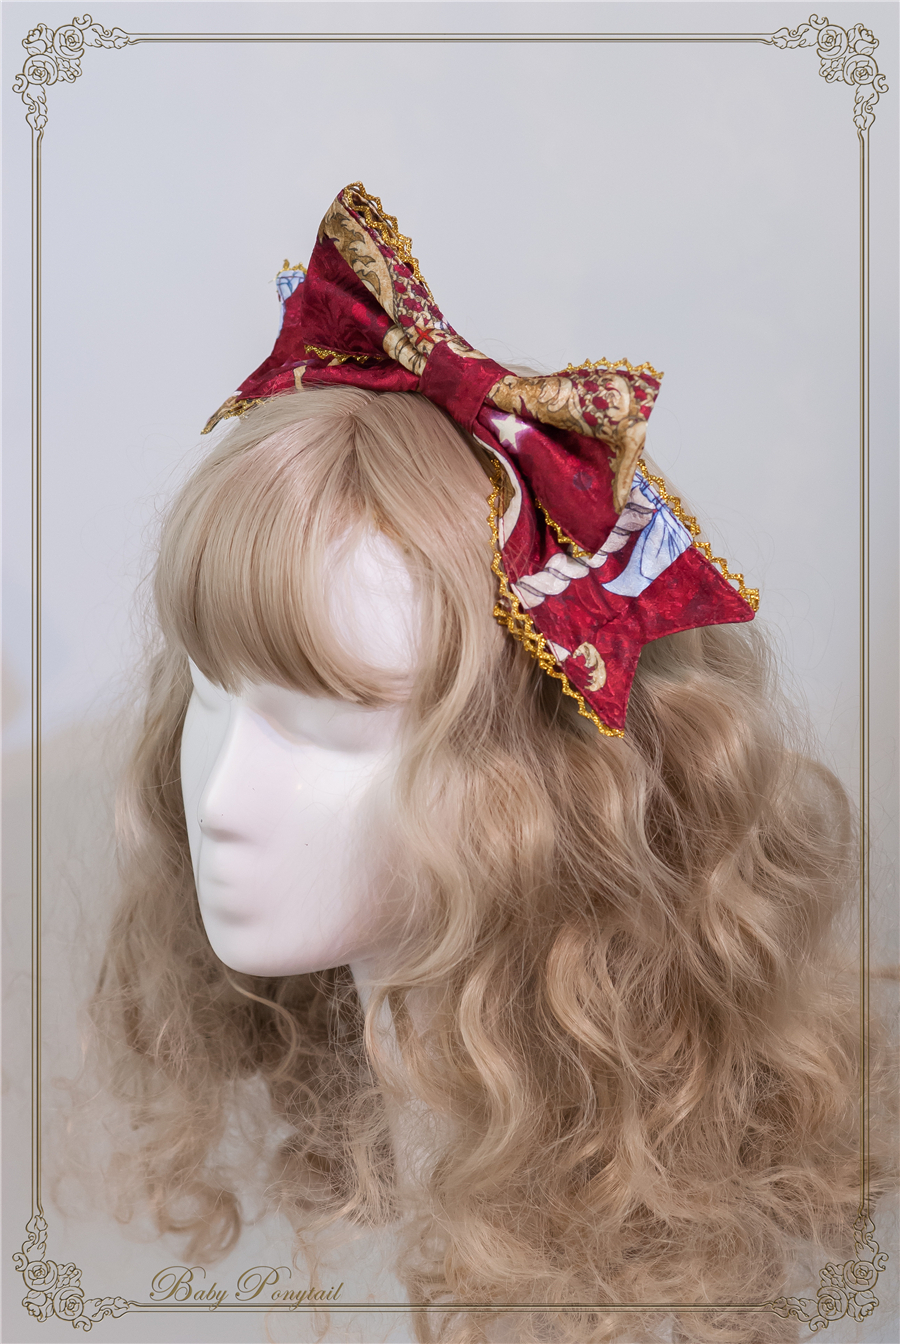 Baby Ponytail_Stock photo_Circus Princess_KC Red_01.jpg